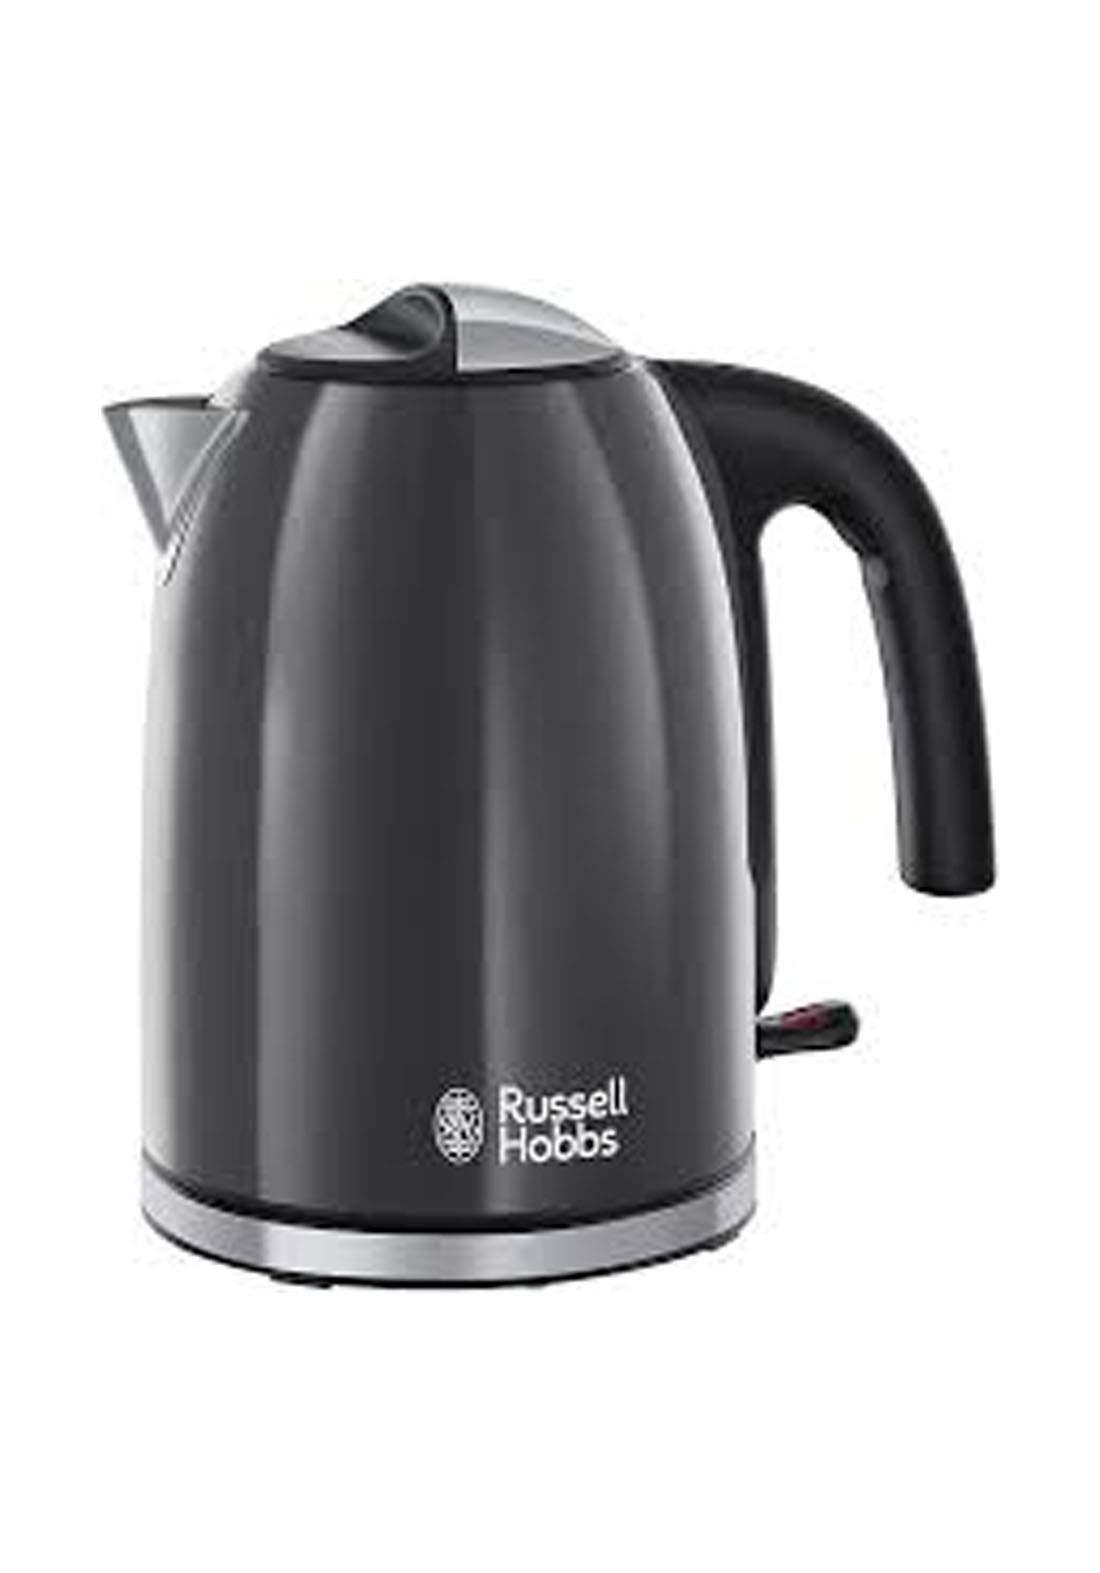 Russell hobbs 20414 Electrical kettle  غلاية